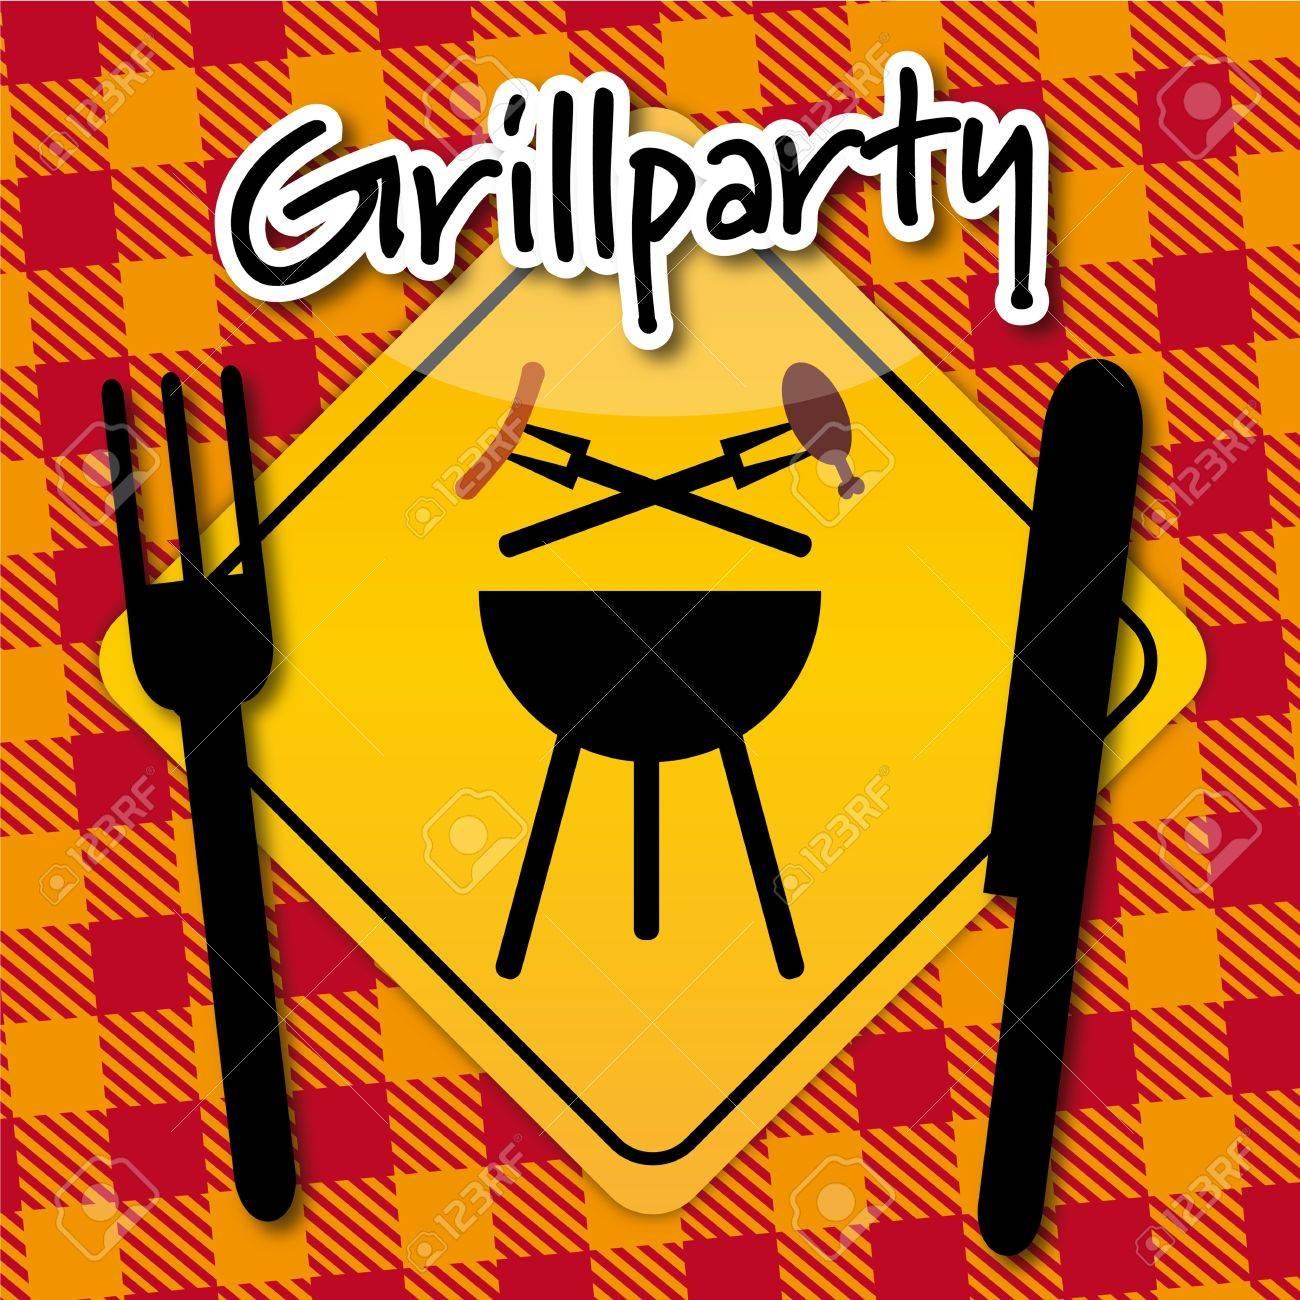 Grillparty Einladung Stock Vector - 18403576